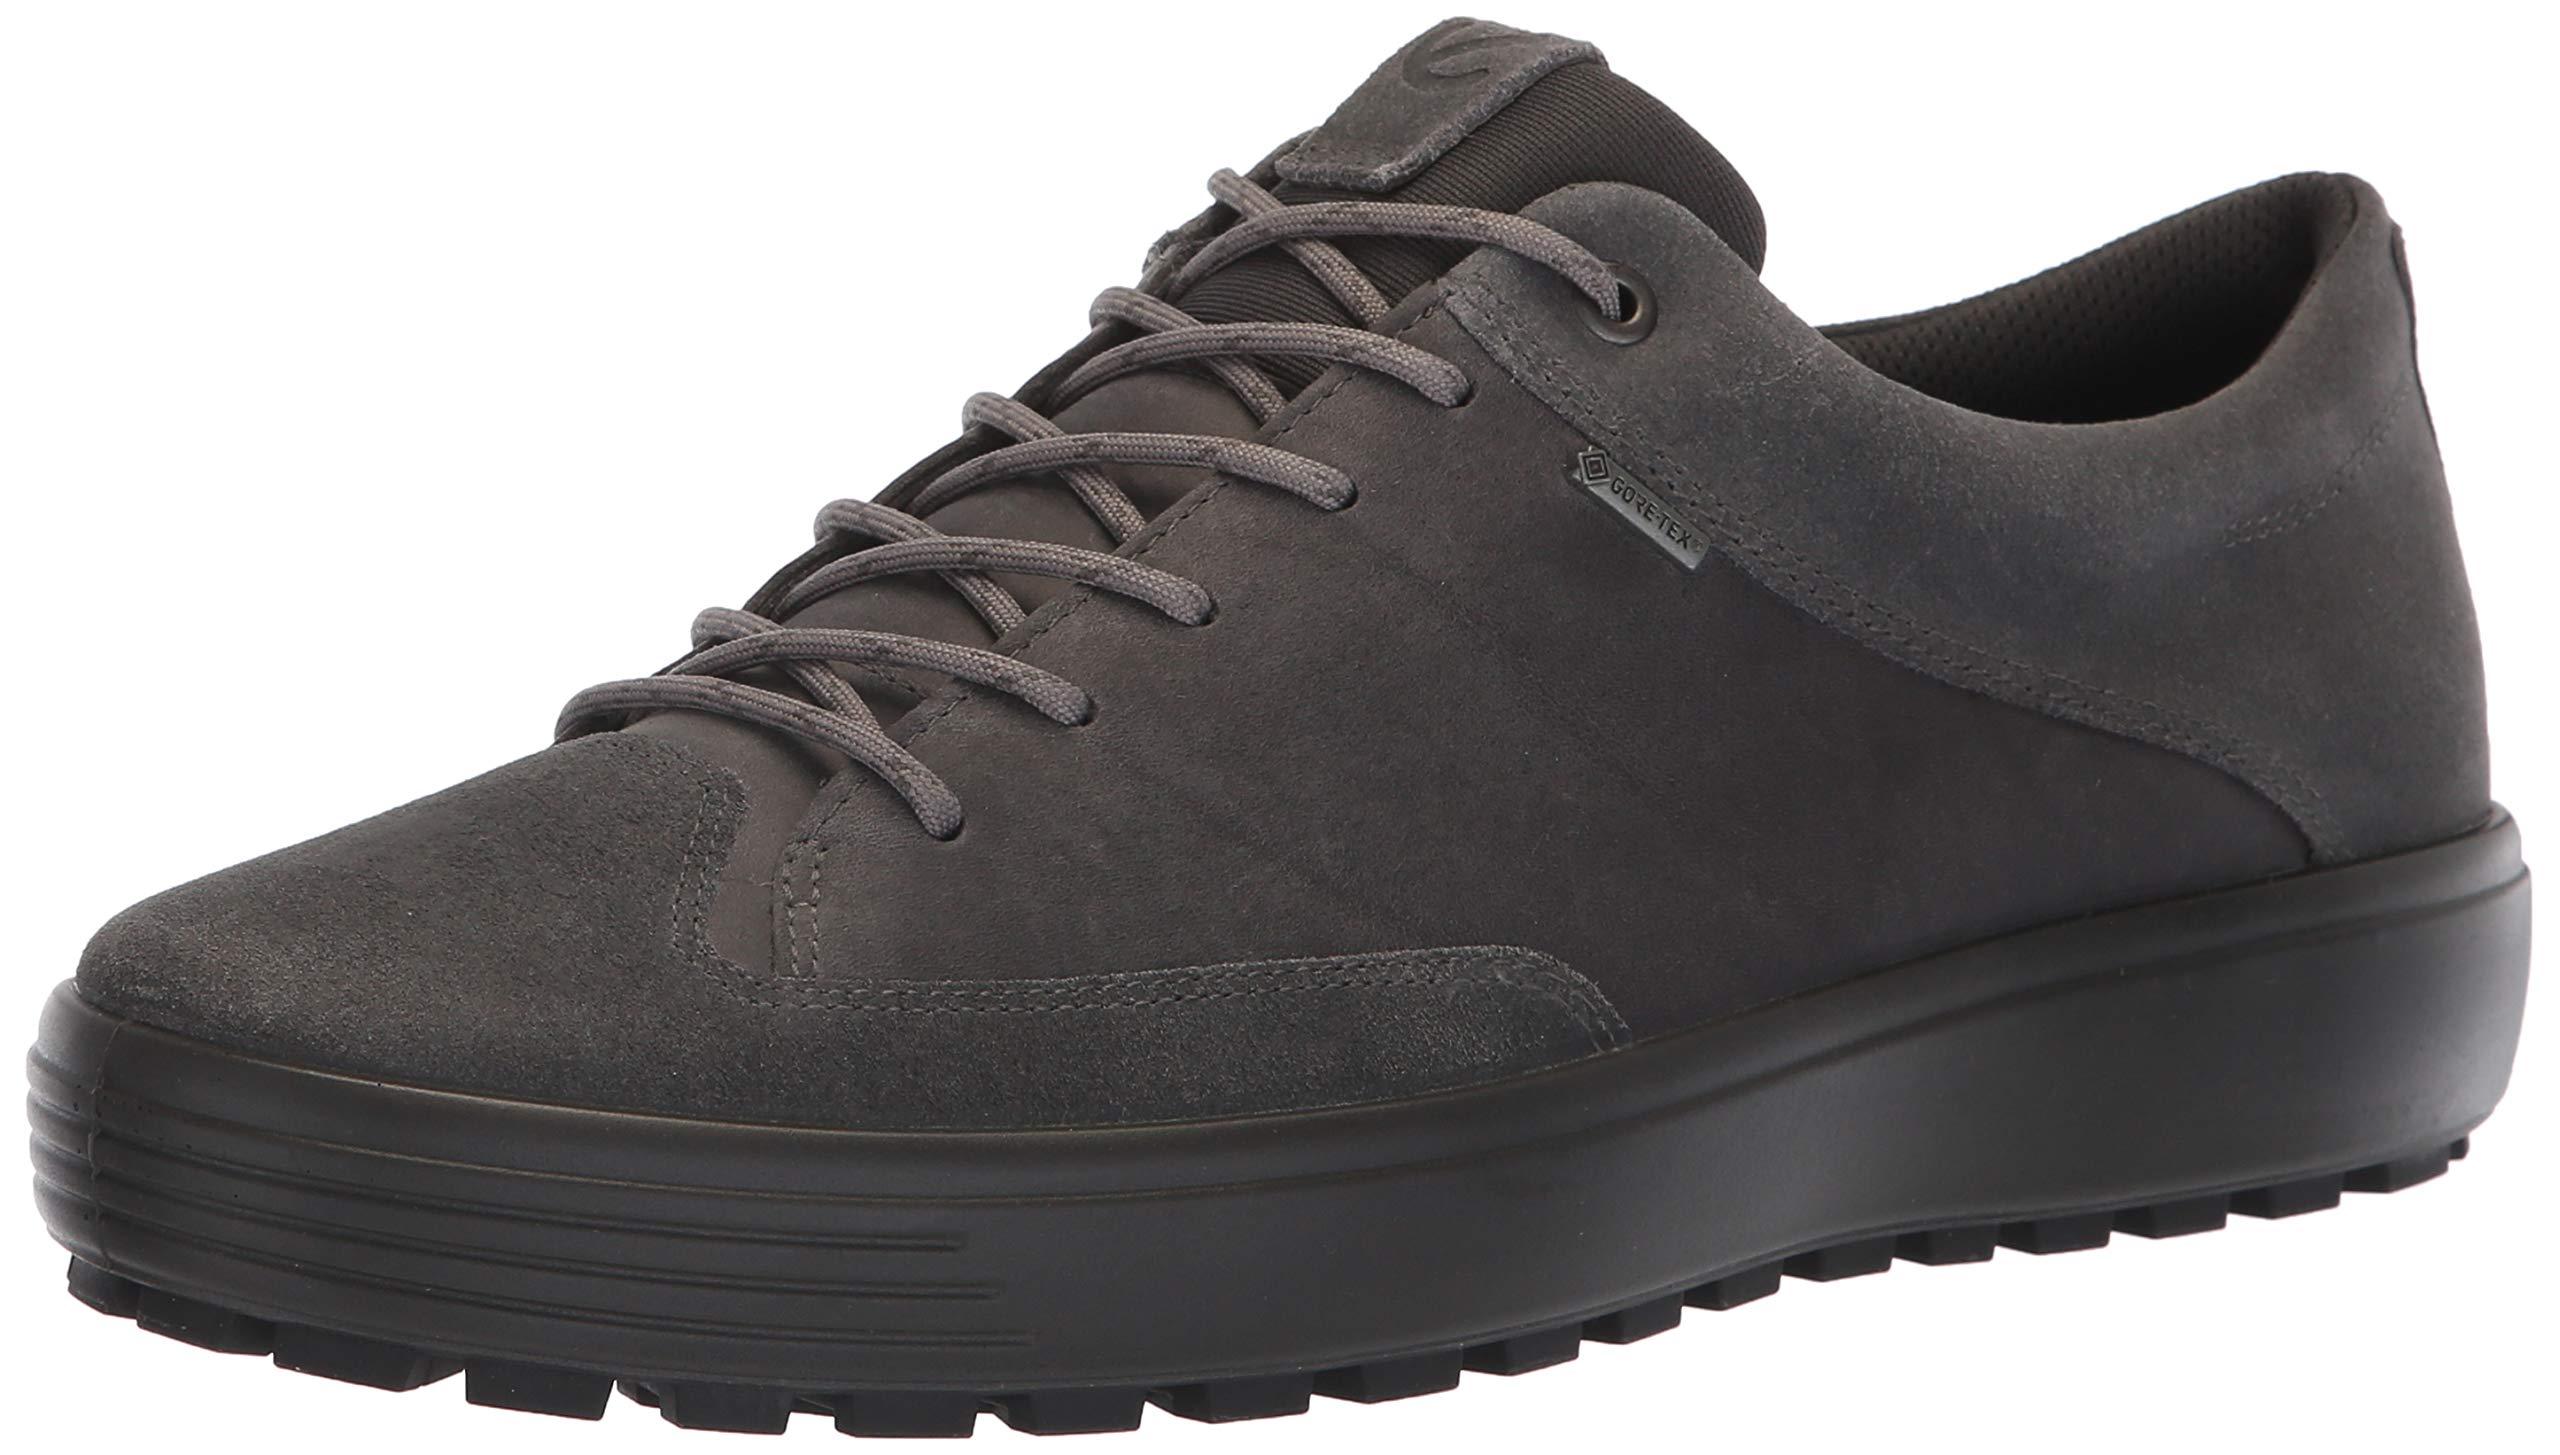 ECCO Men's Soft 7 TRED Low Gore-TEX Sneaker, Magnet Suede/Magnet Nubuck, 44 M EU (10-10.5 US) by ECCO